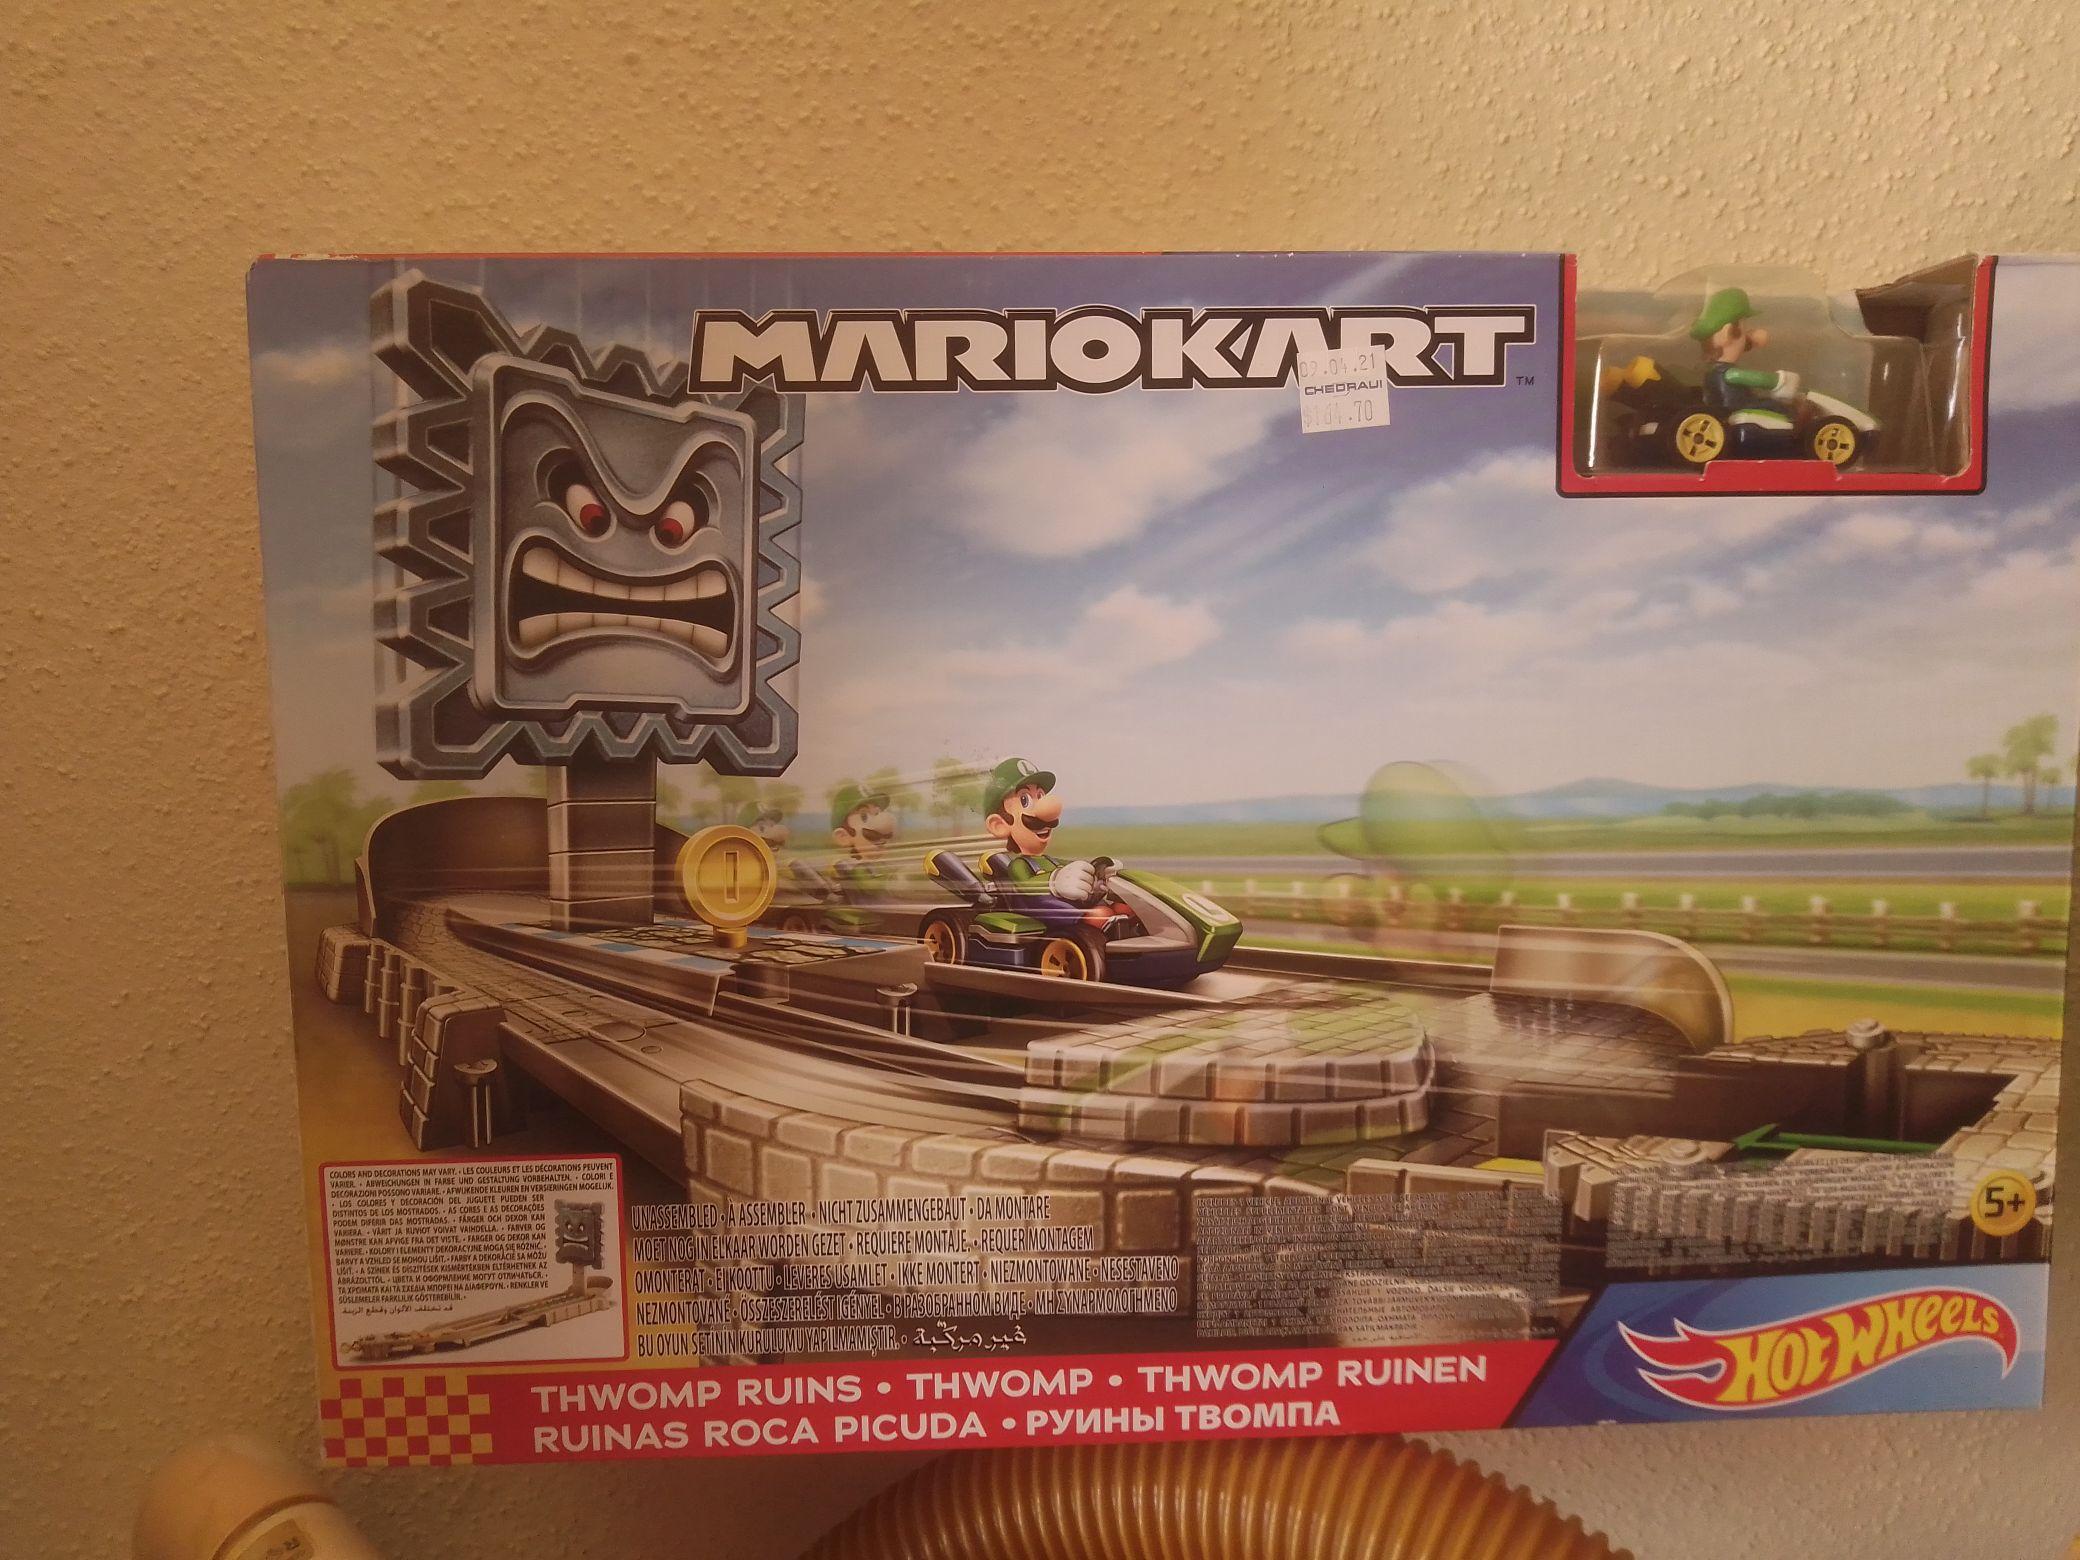 Chedraui selecto: Pista hot wheels Mario kart Ruinas roca picuda